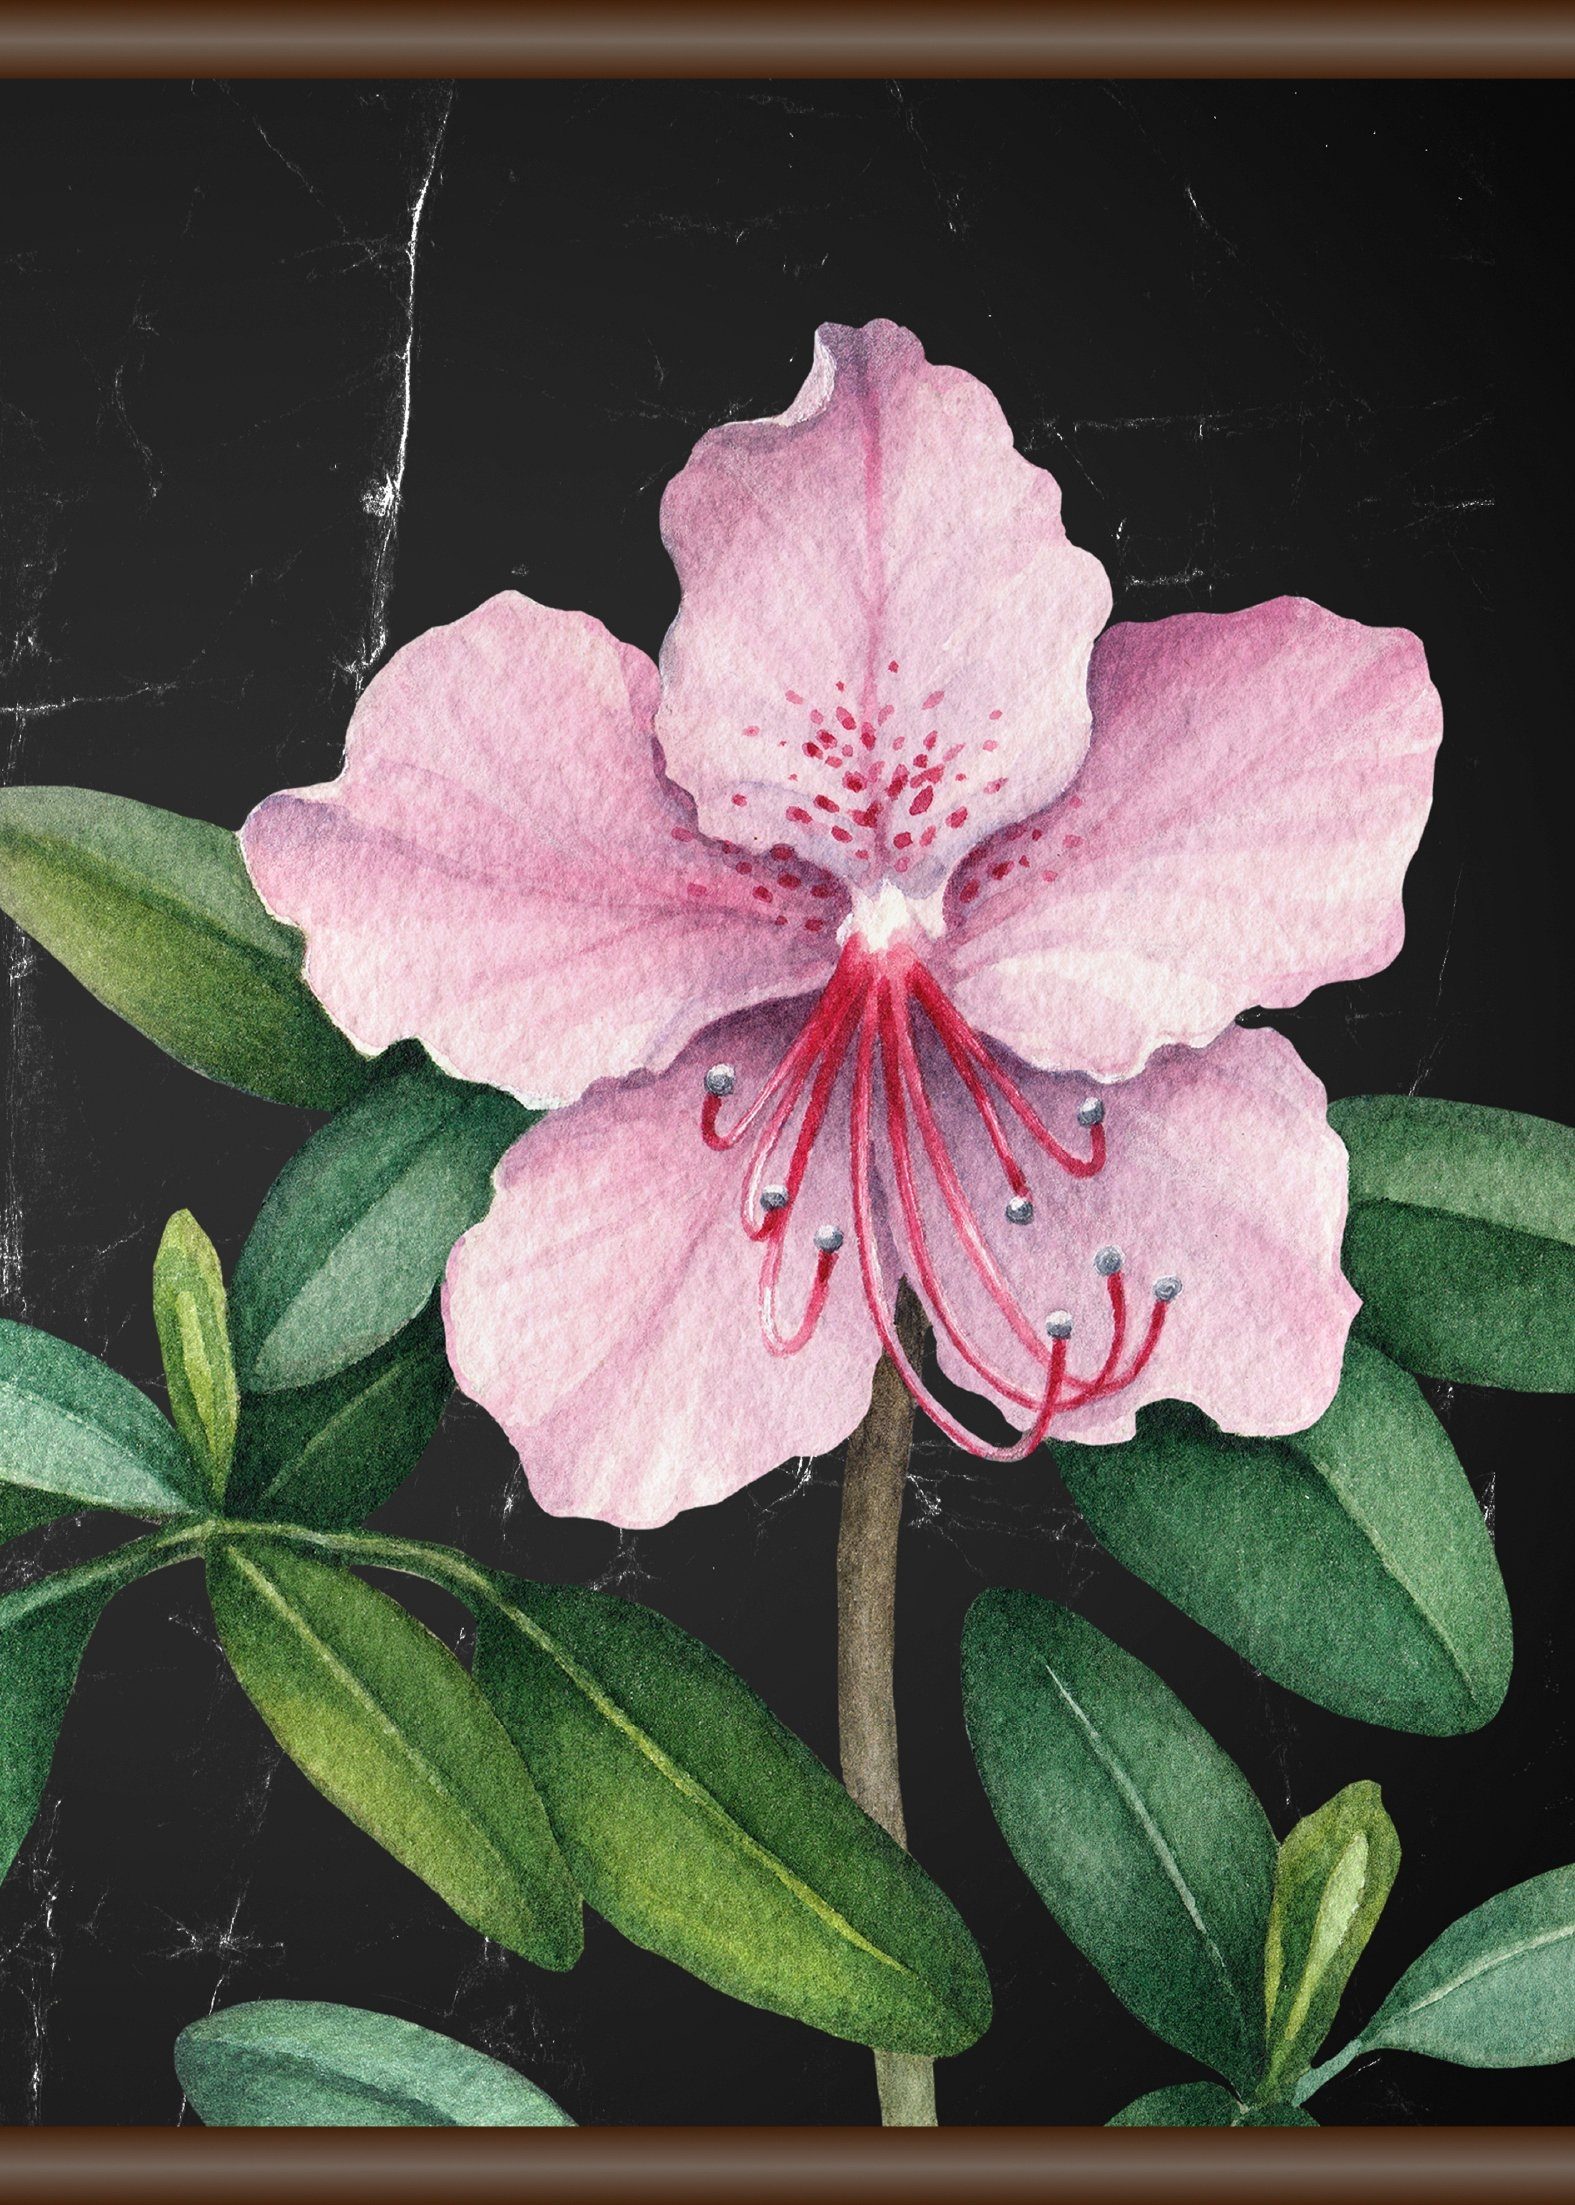 Queence Linnen »roze bloem«, Screen scroll schilderij 50x70 cm online kopen op otto.nl